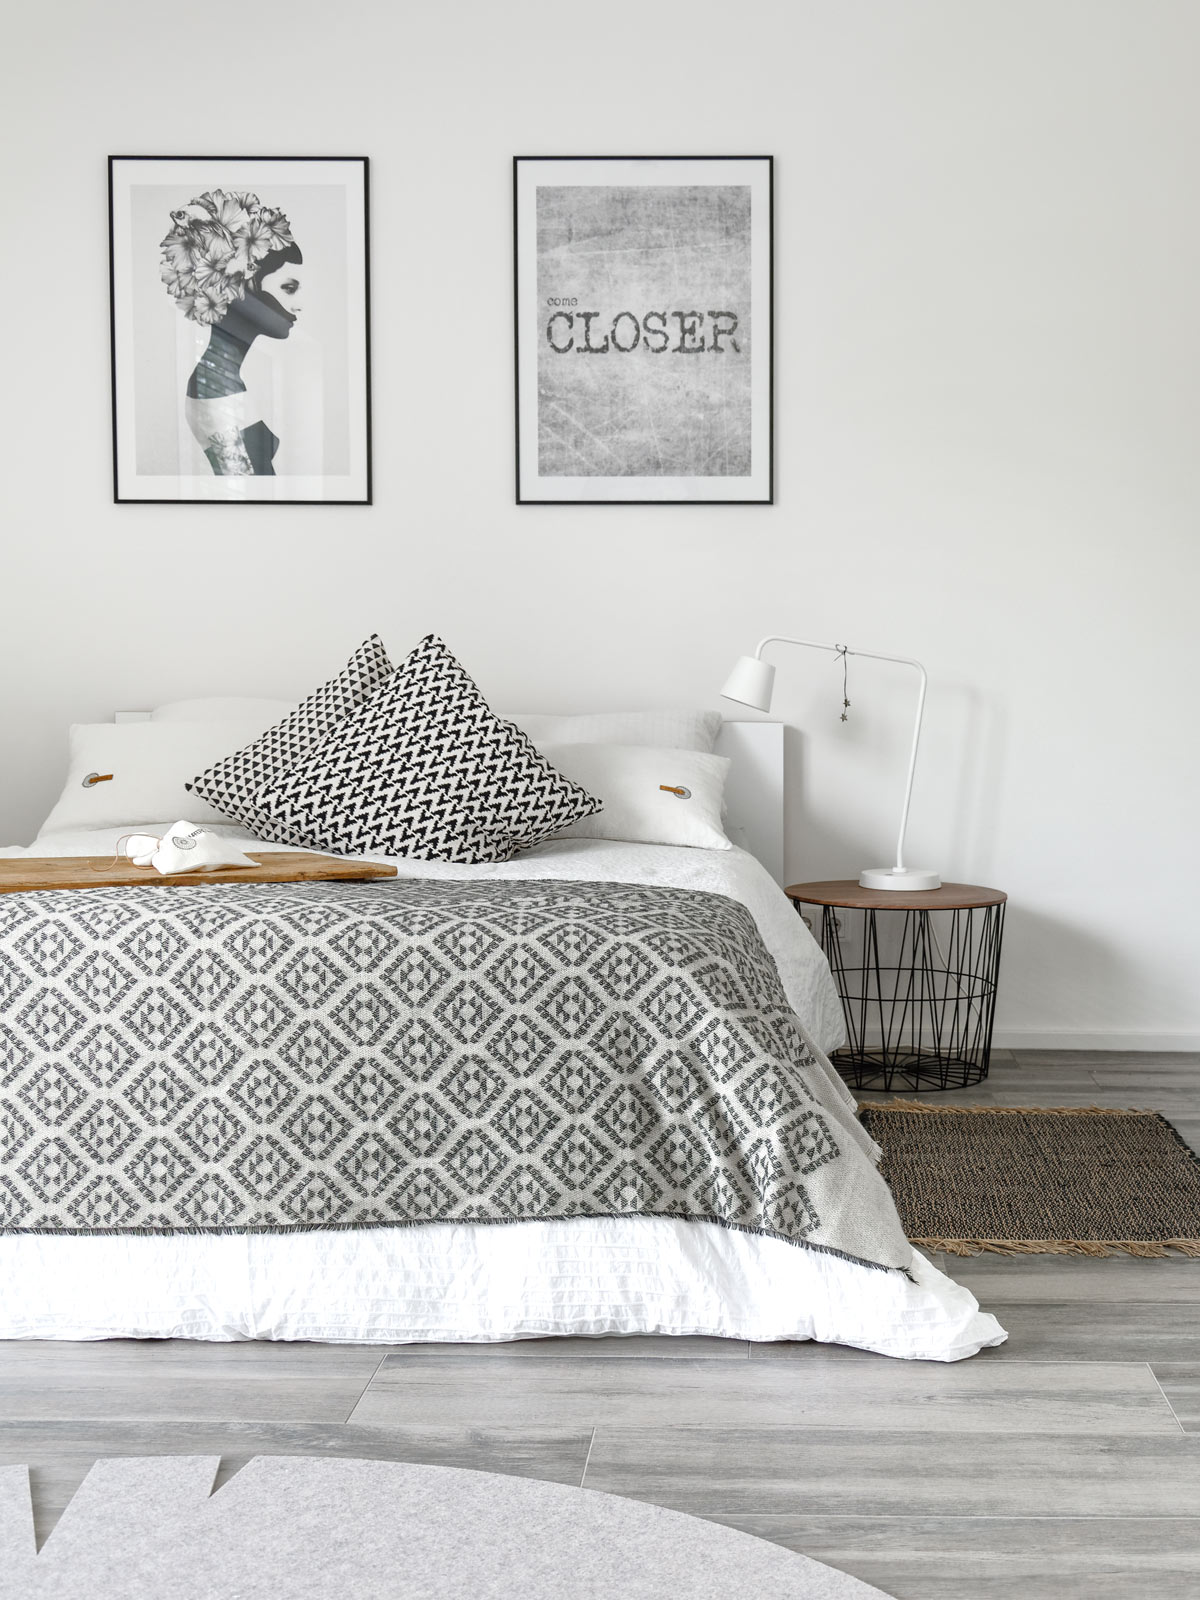 diy kissenh llen aus leinen mit ethno detail mxliving. Black Bedroom Furniture Sets. Home Design Ideas